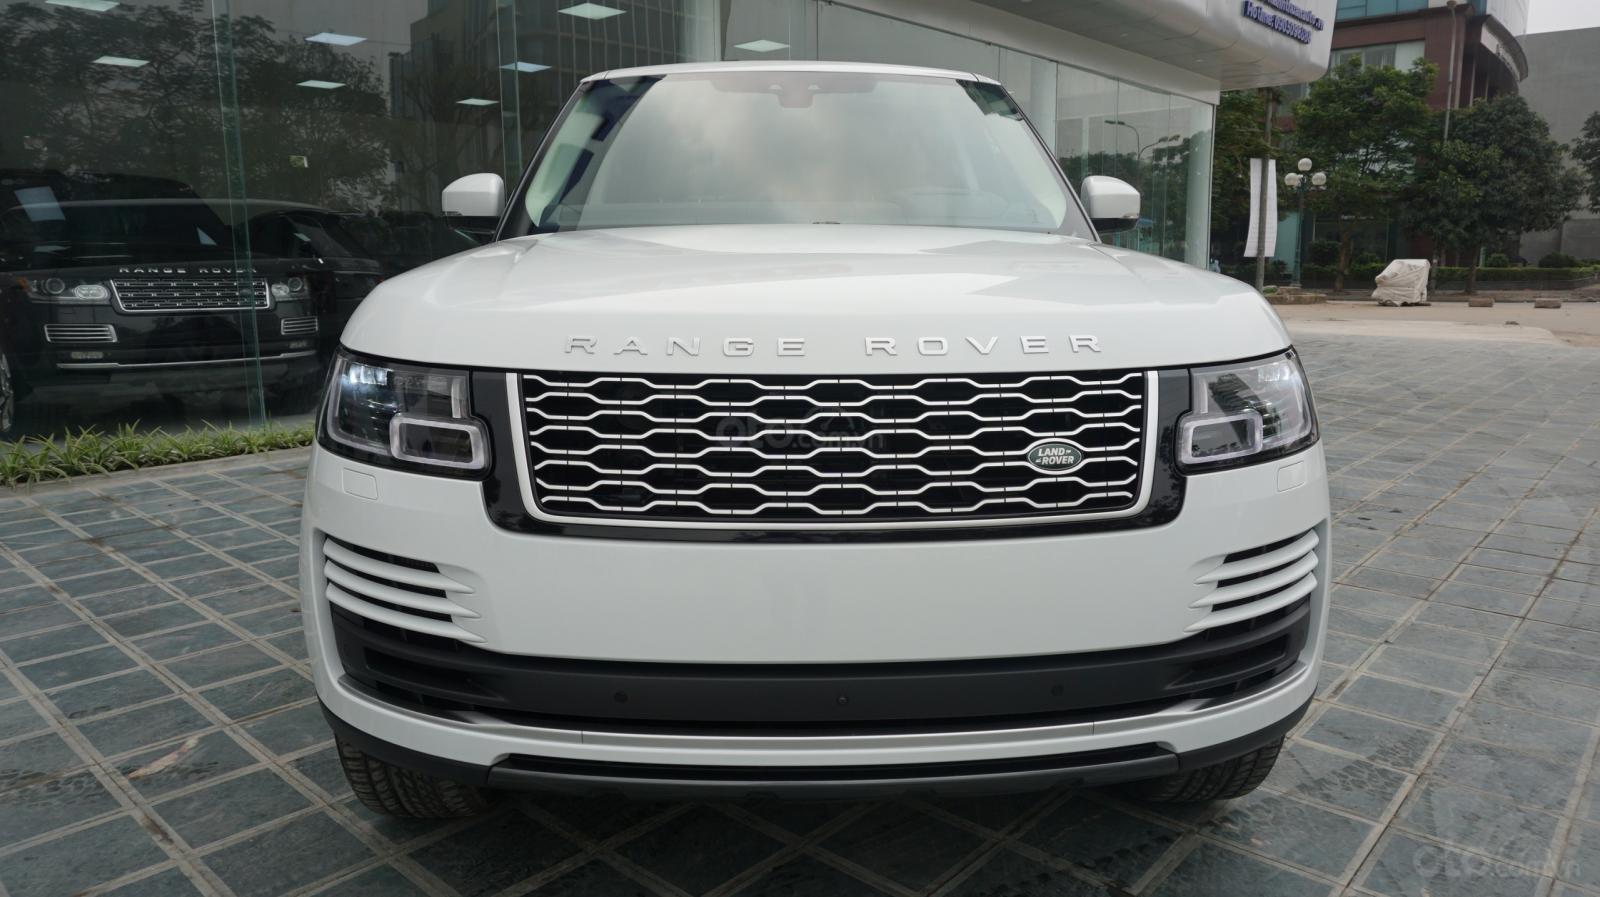 Cần bán xe LandRover Range Rover HSE năm 2019, màu trắng, xe nhập-9